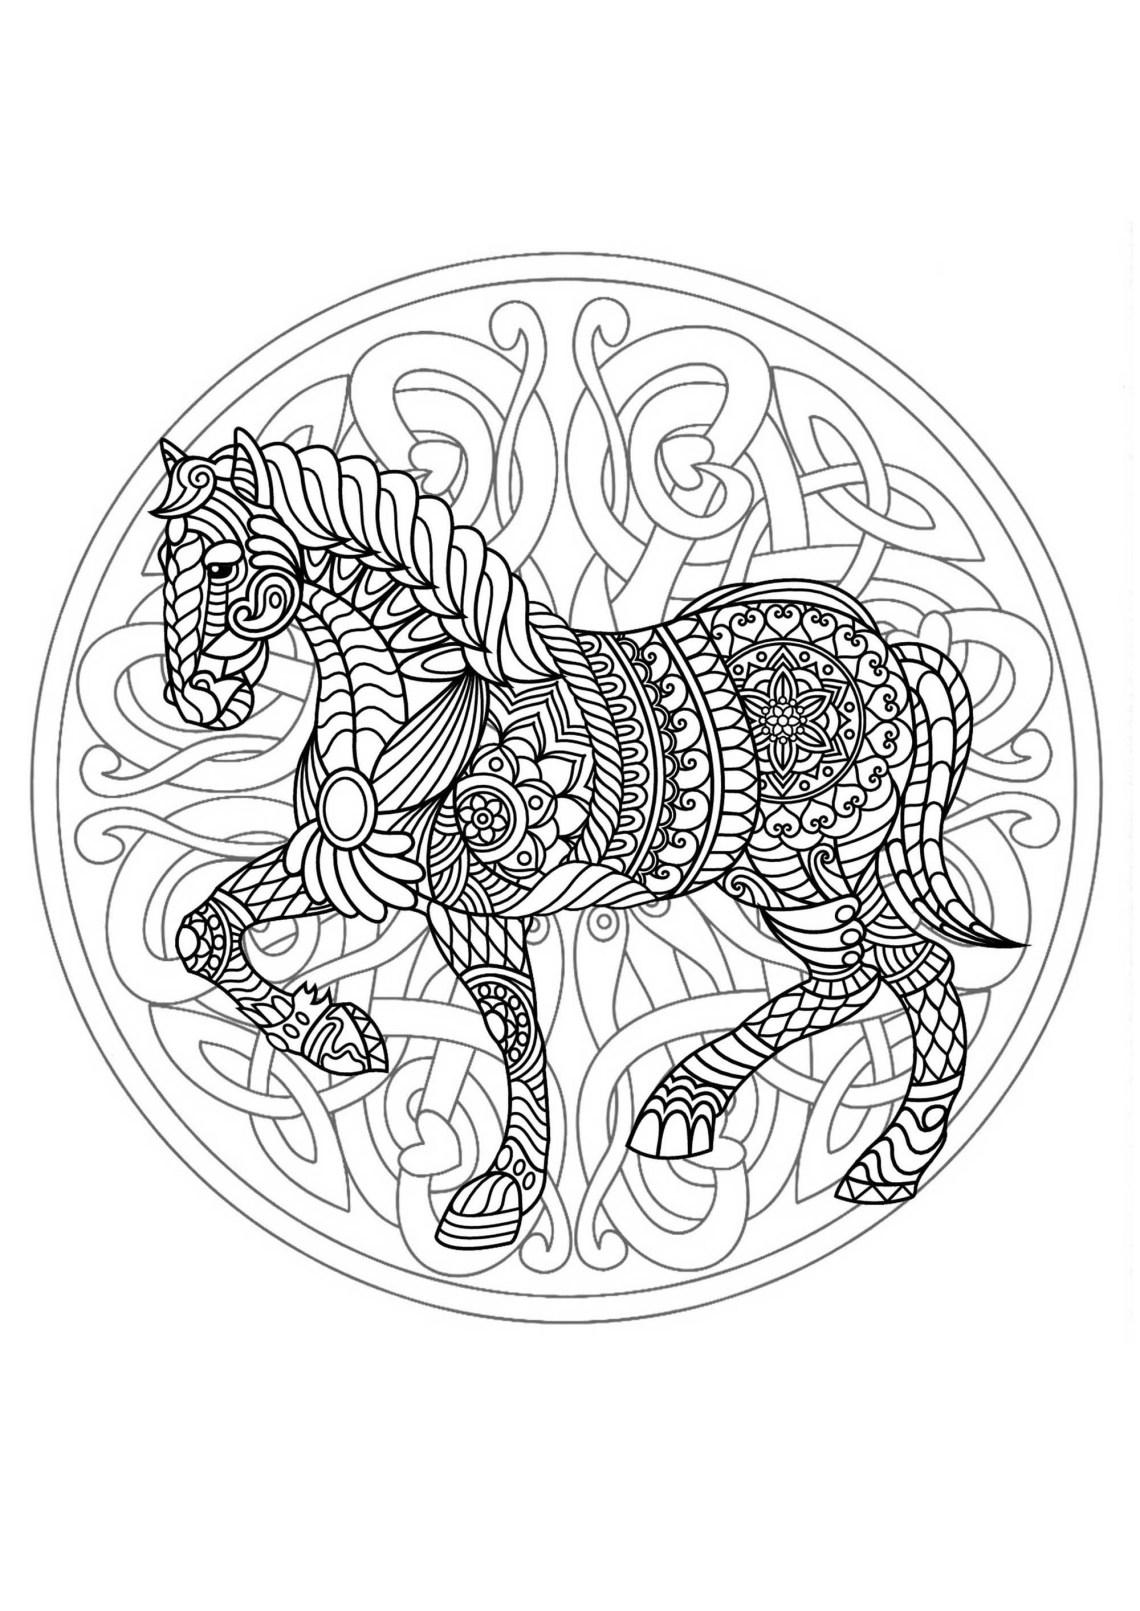 Mandala with beautiful Horse and interlaced patterns - M ... | mandala art coloring pages animals